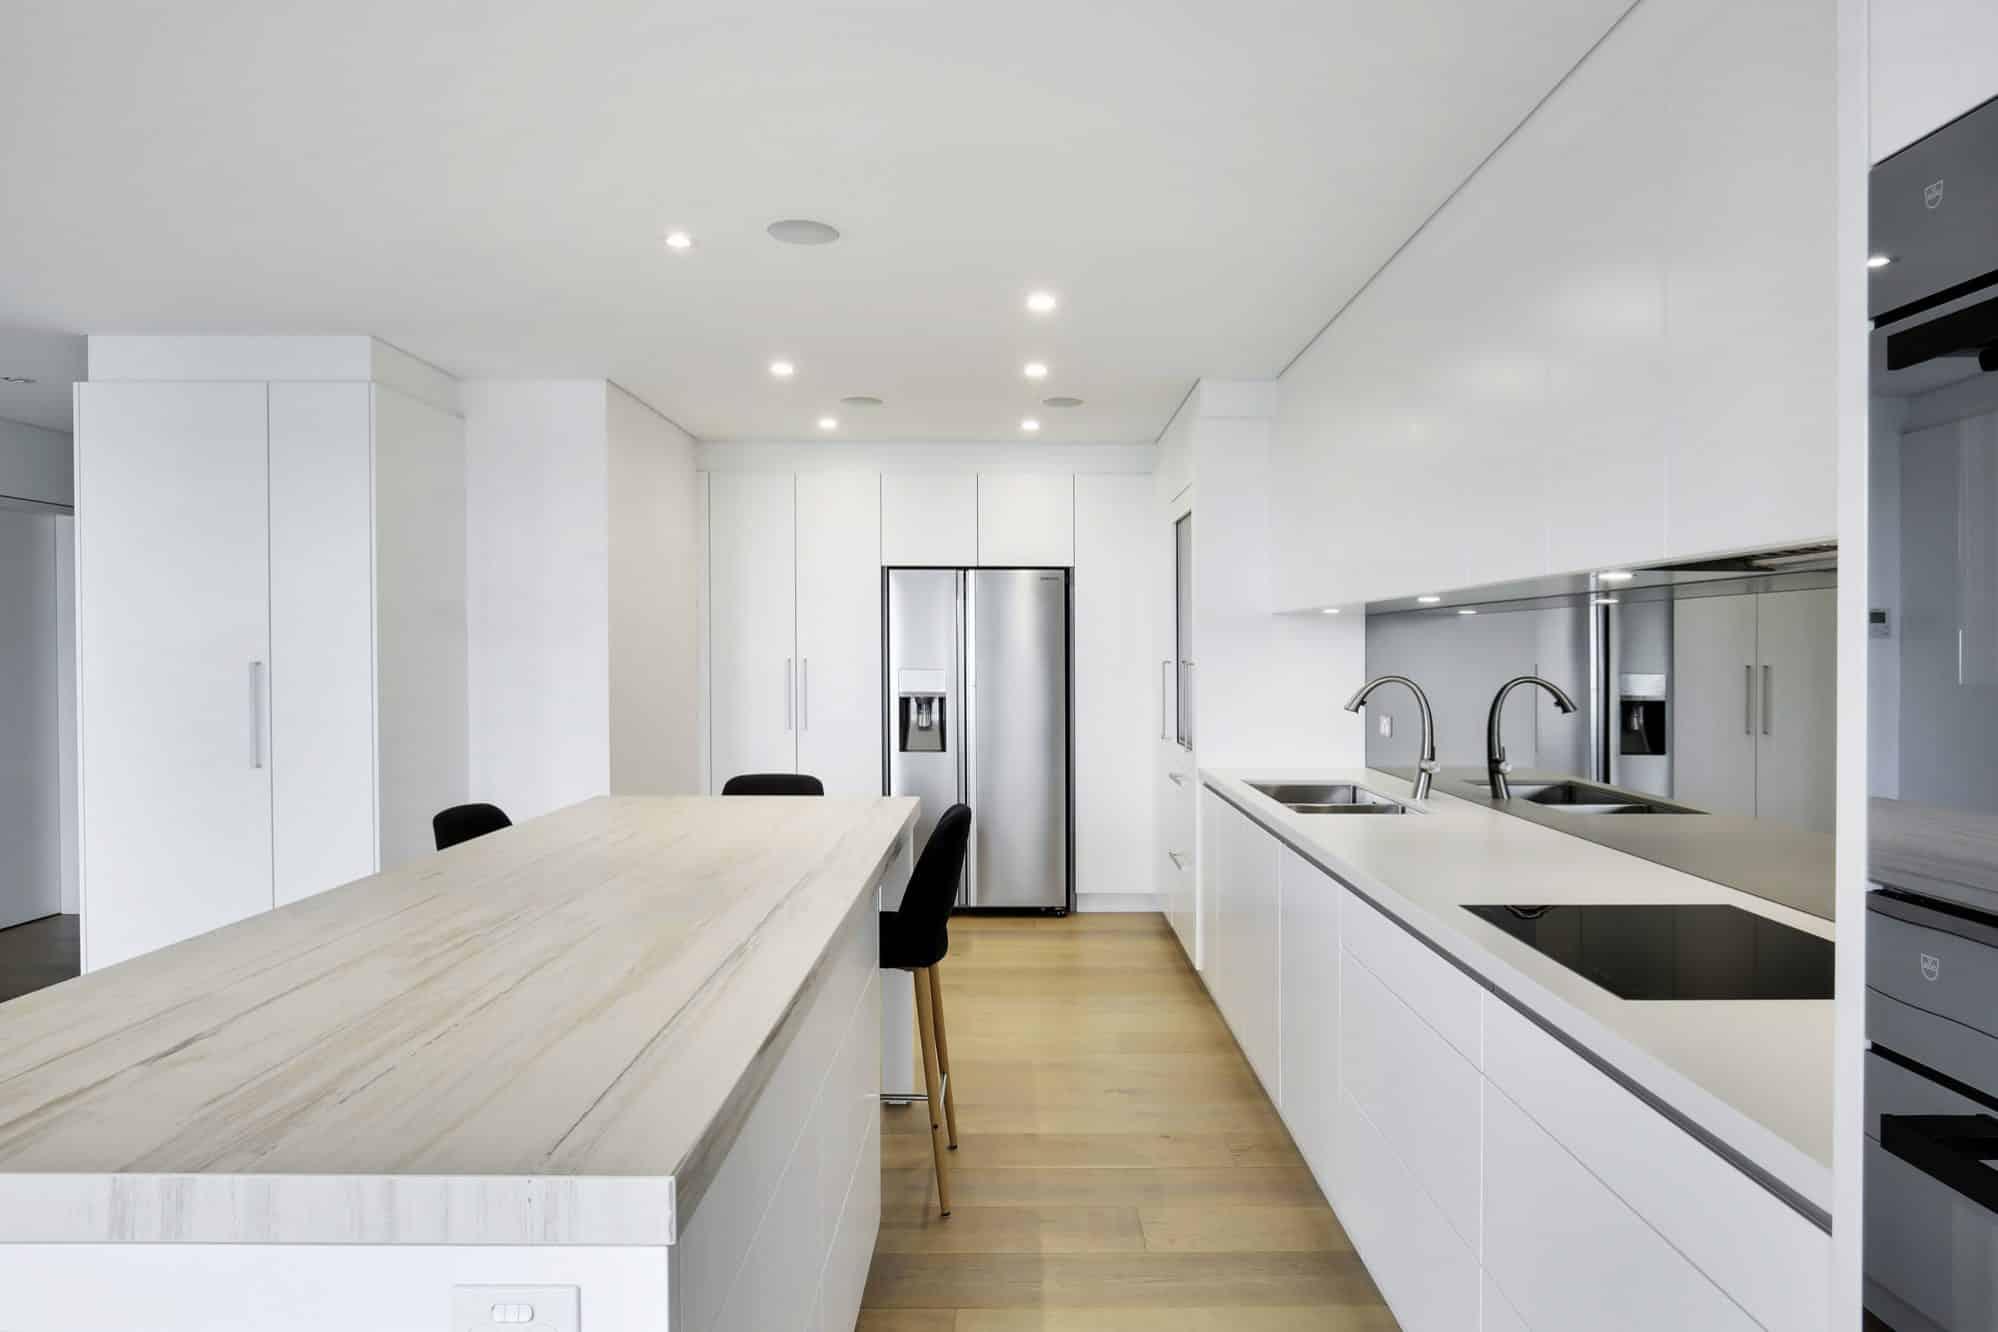 A sharp looking kitchen